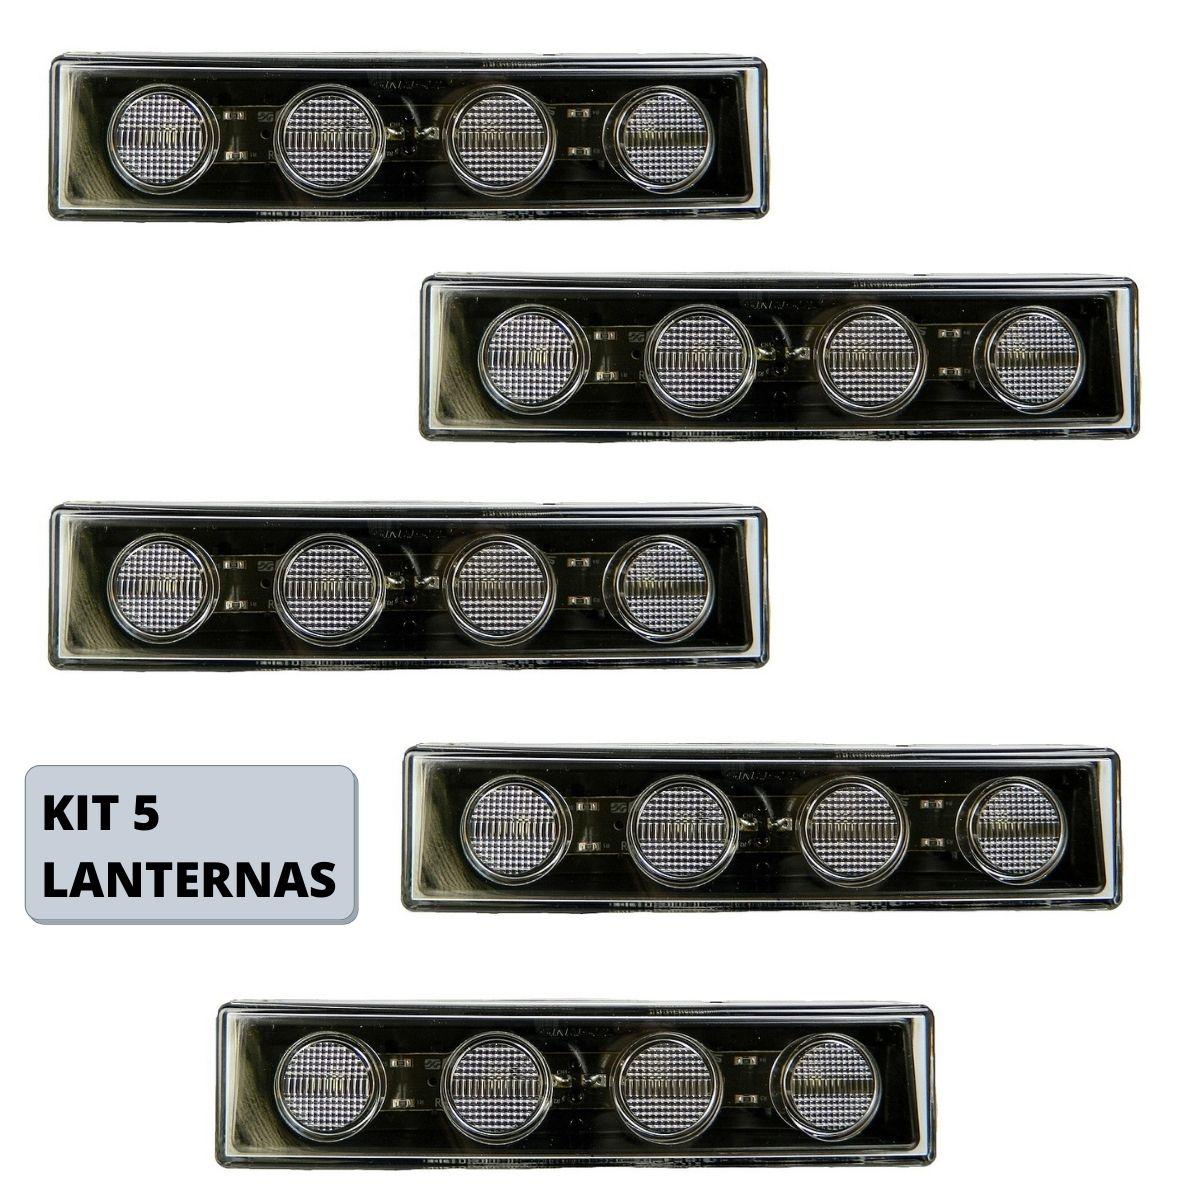 Kit 5 Lanternas Tapa Sol Scania Serie 5 S5